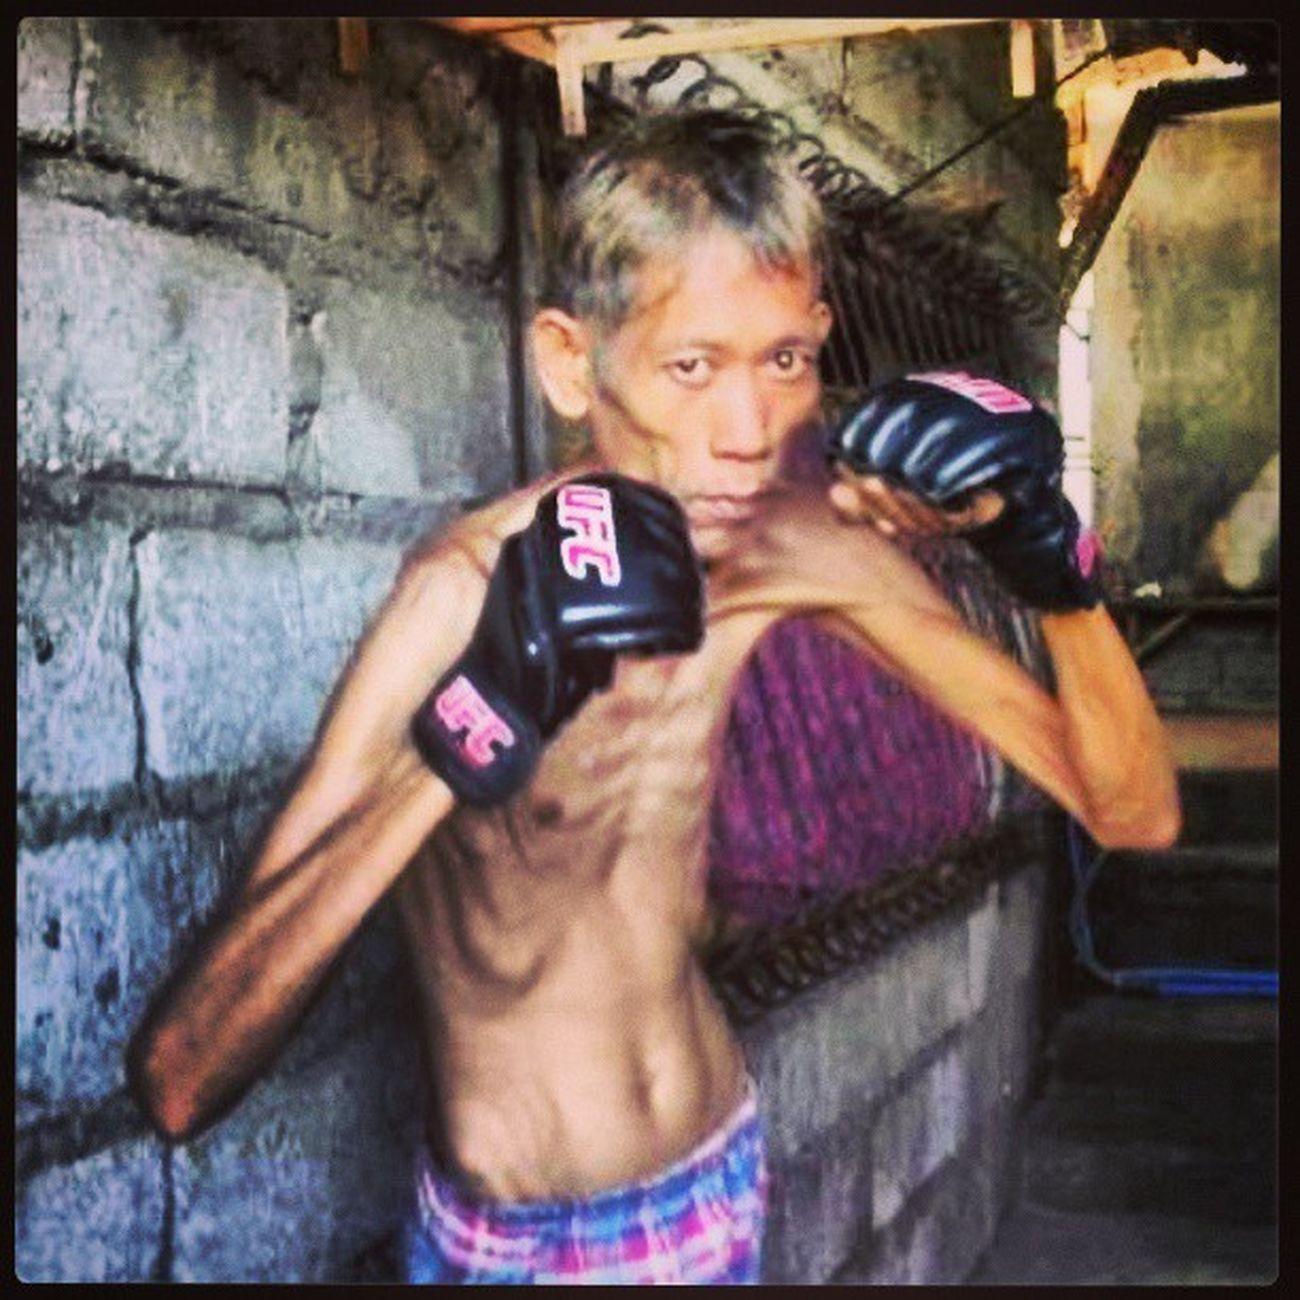 Future ufc heavyweight champion... UFC MMA Macau Strikeforce lungcancer